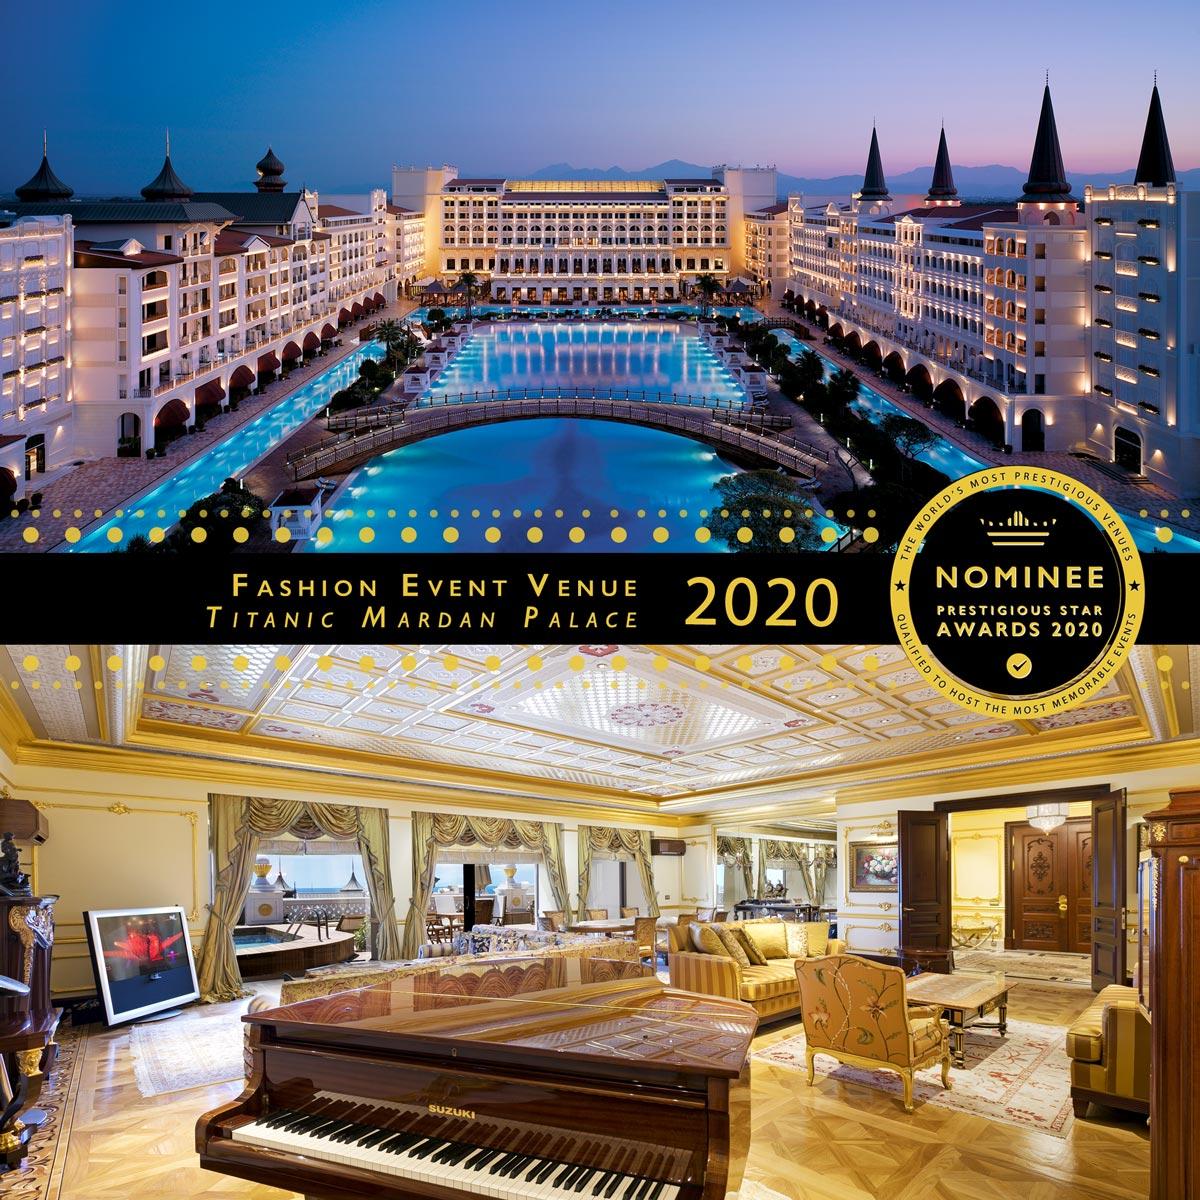 The King Suite at Titanic Mardan Palace